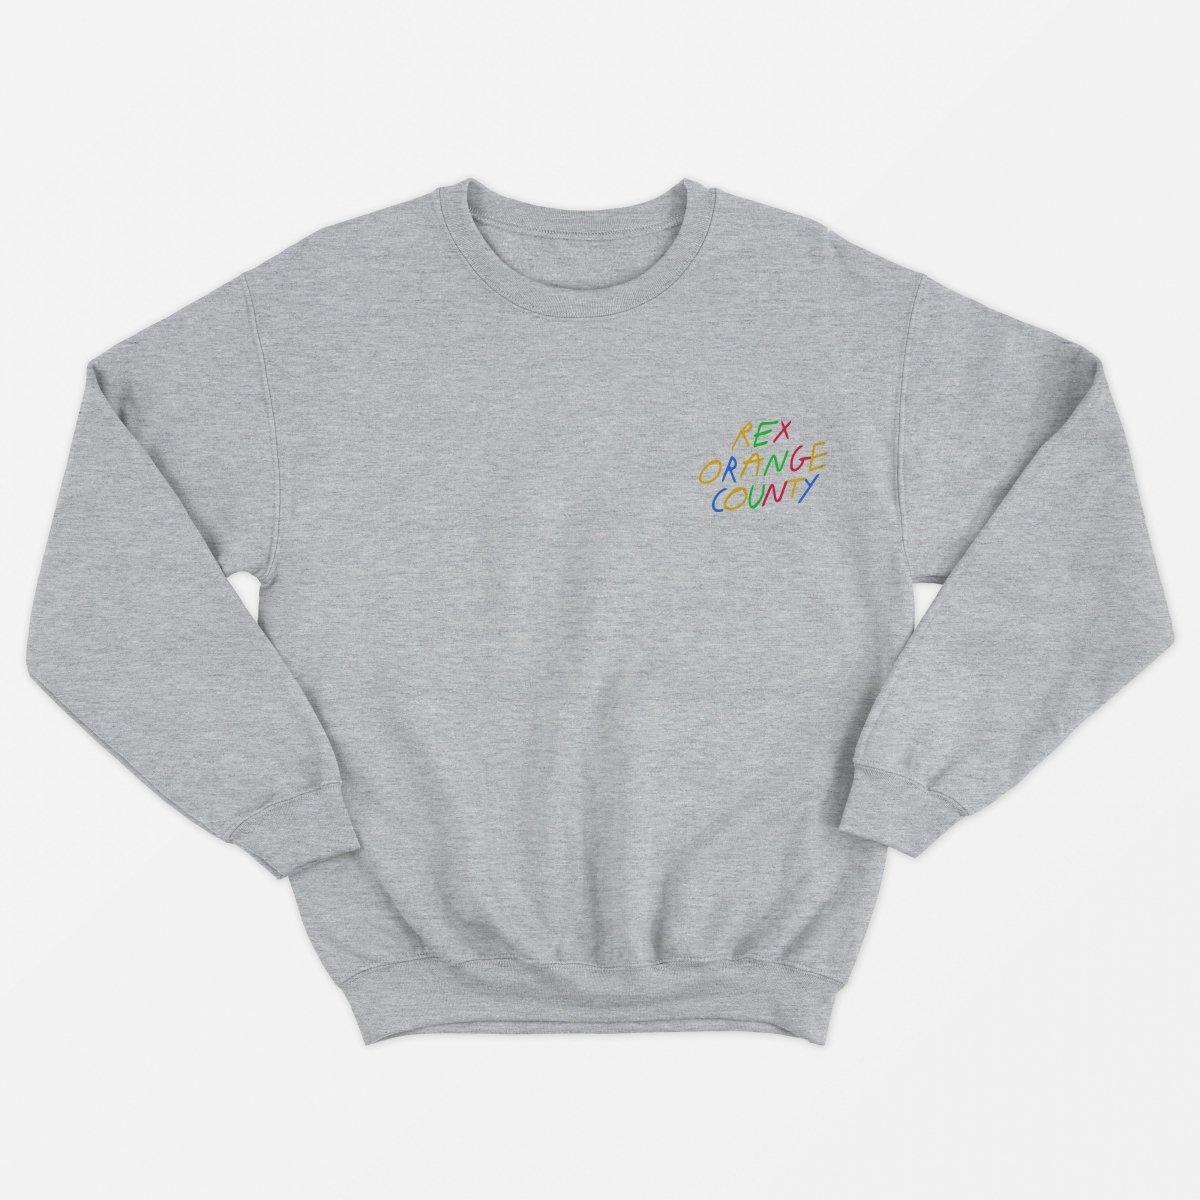 Rex Orange County - Pony Cascading Note Unisex Sweater